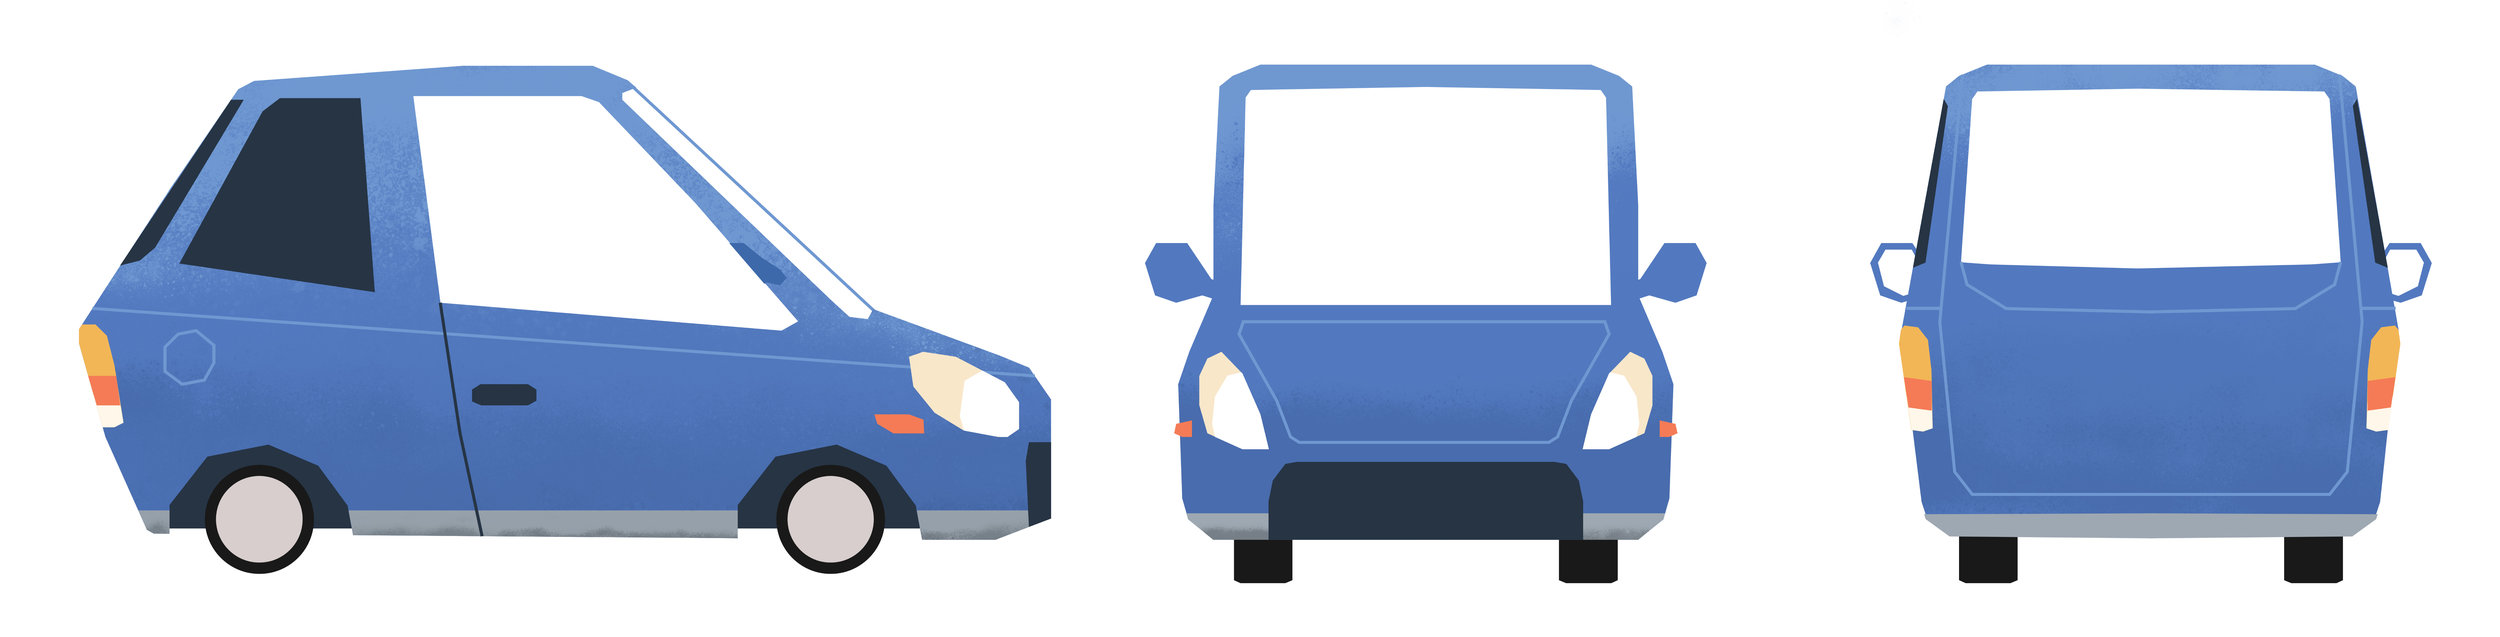 SmallCar.jpg